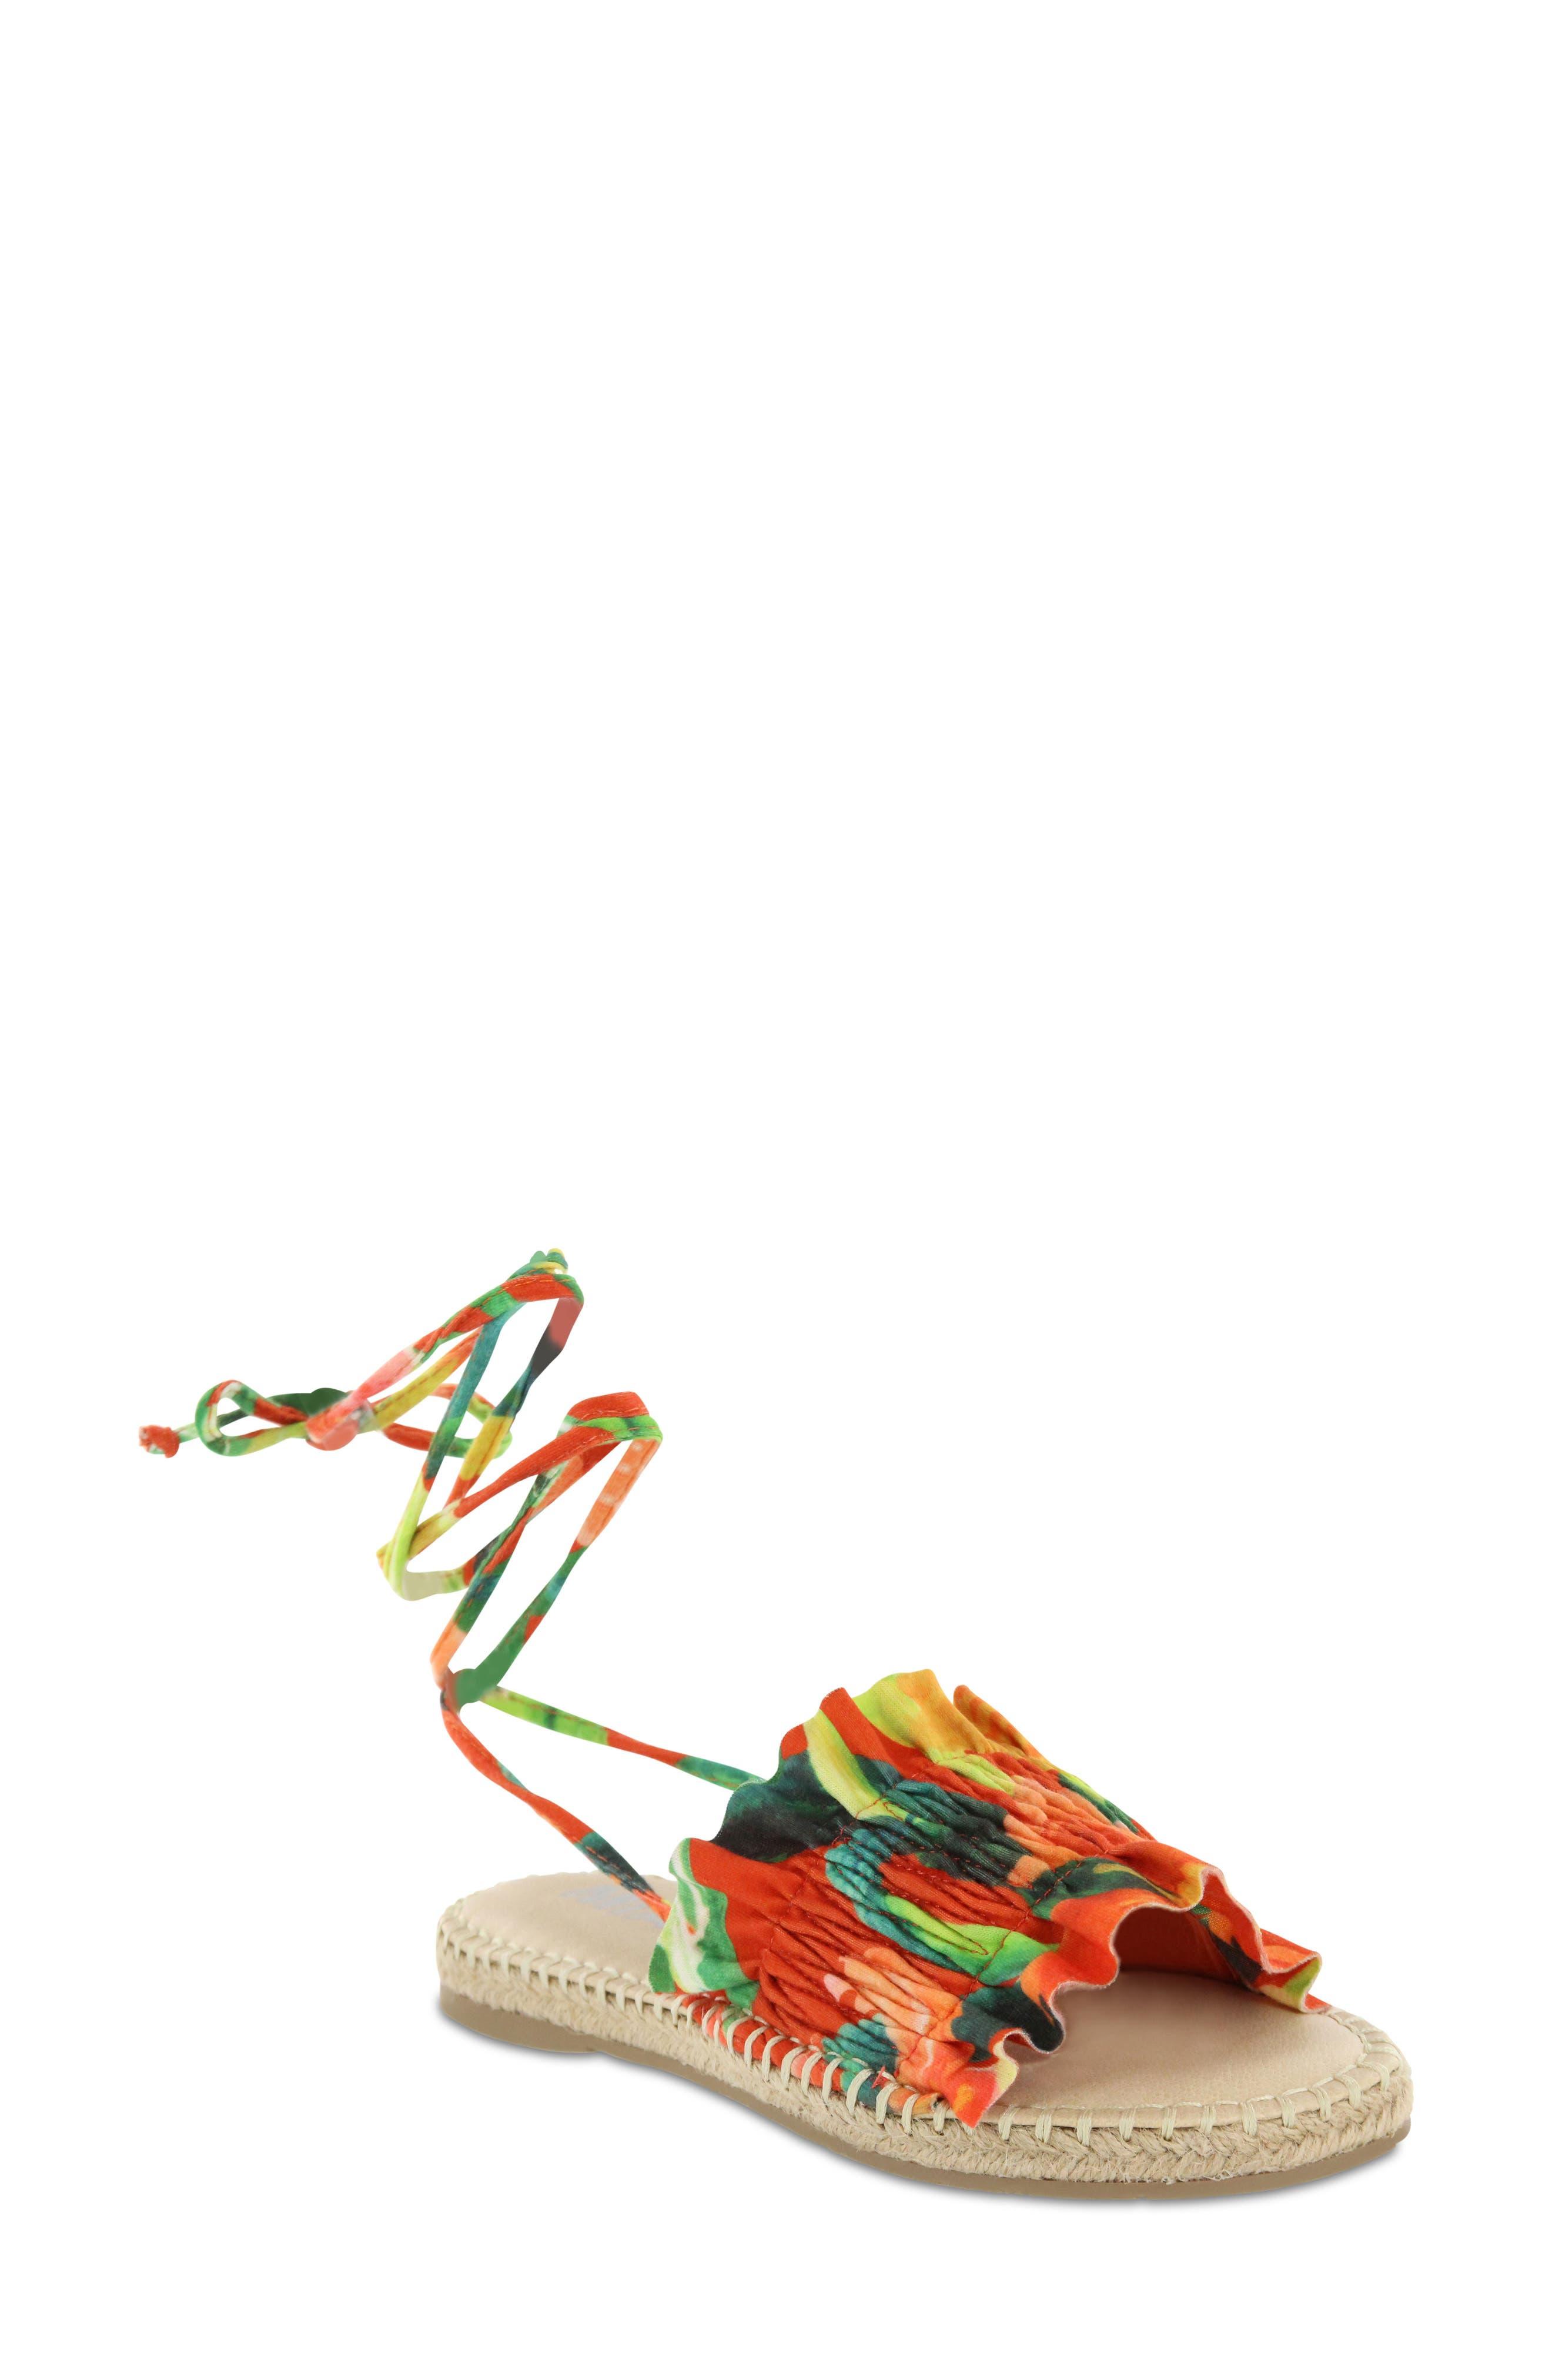 Annalise Sandal,                             Main thumbnail 1, color,                             Red Amazon Scrunch Fabric